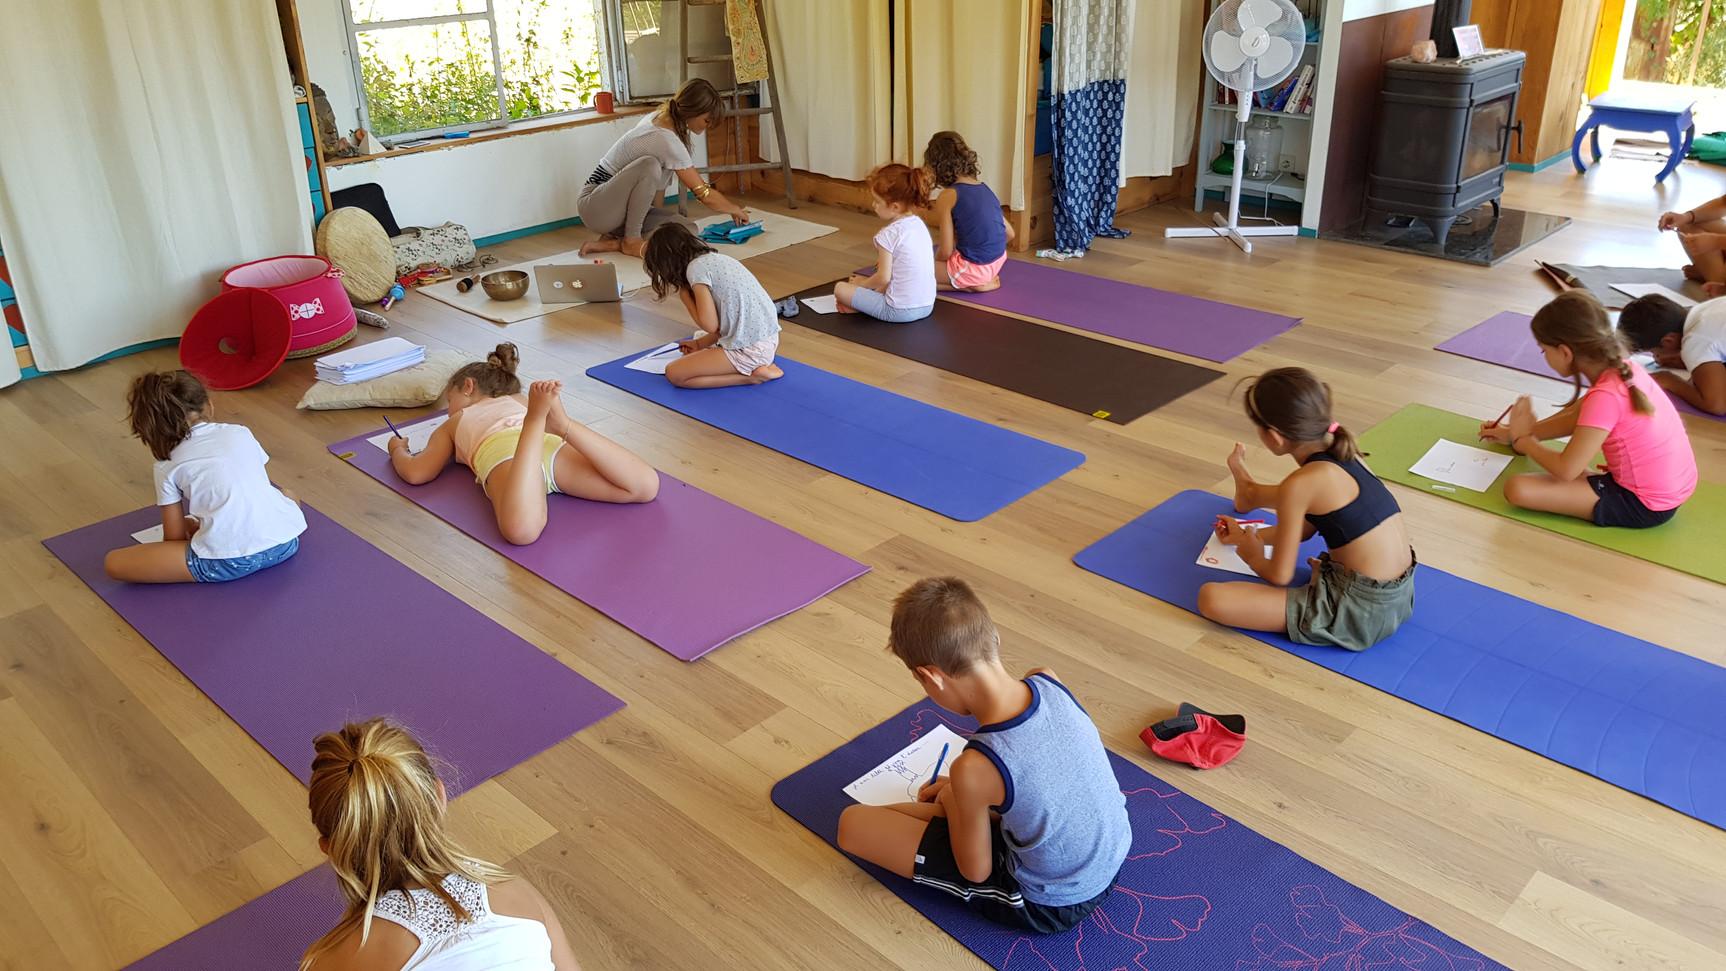 Poser en image l'éco de son voyage yoga.....